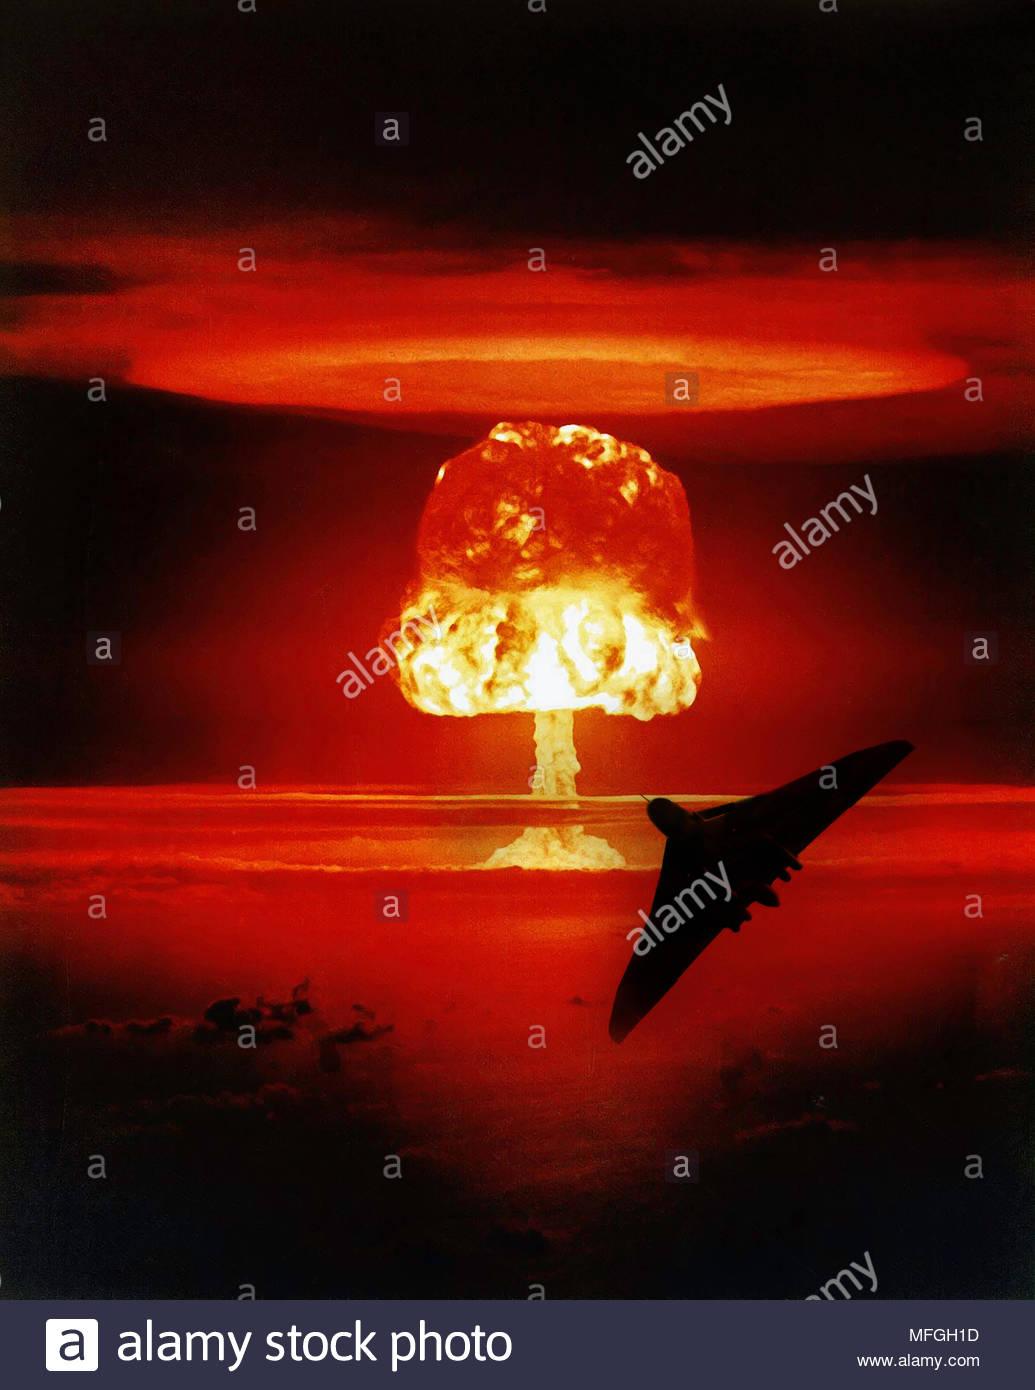 Nuclear Armageddon - Stock Image